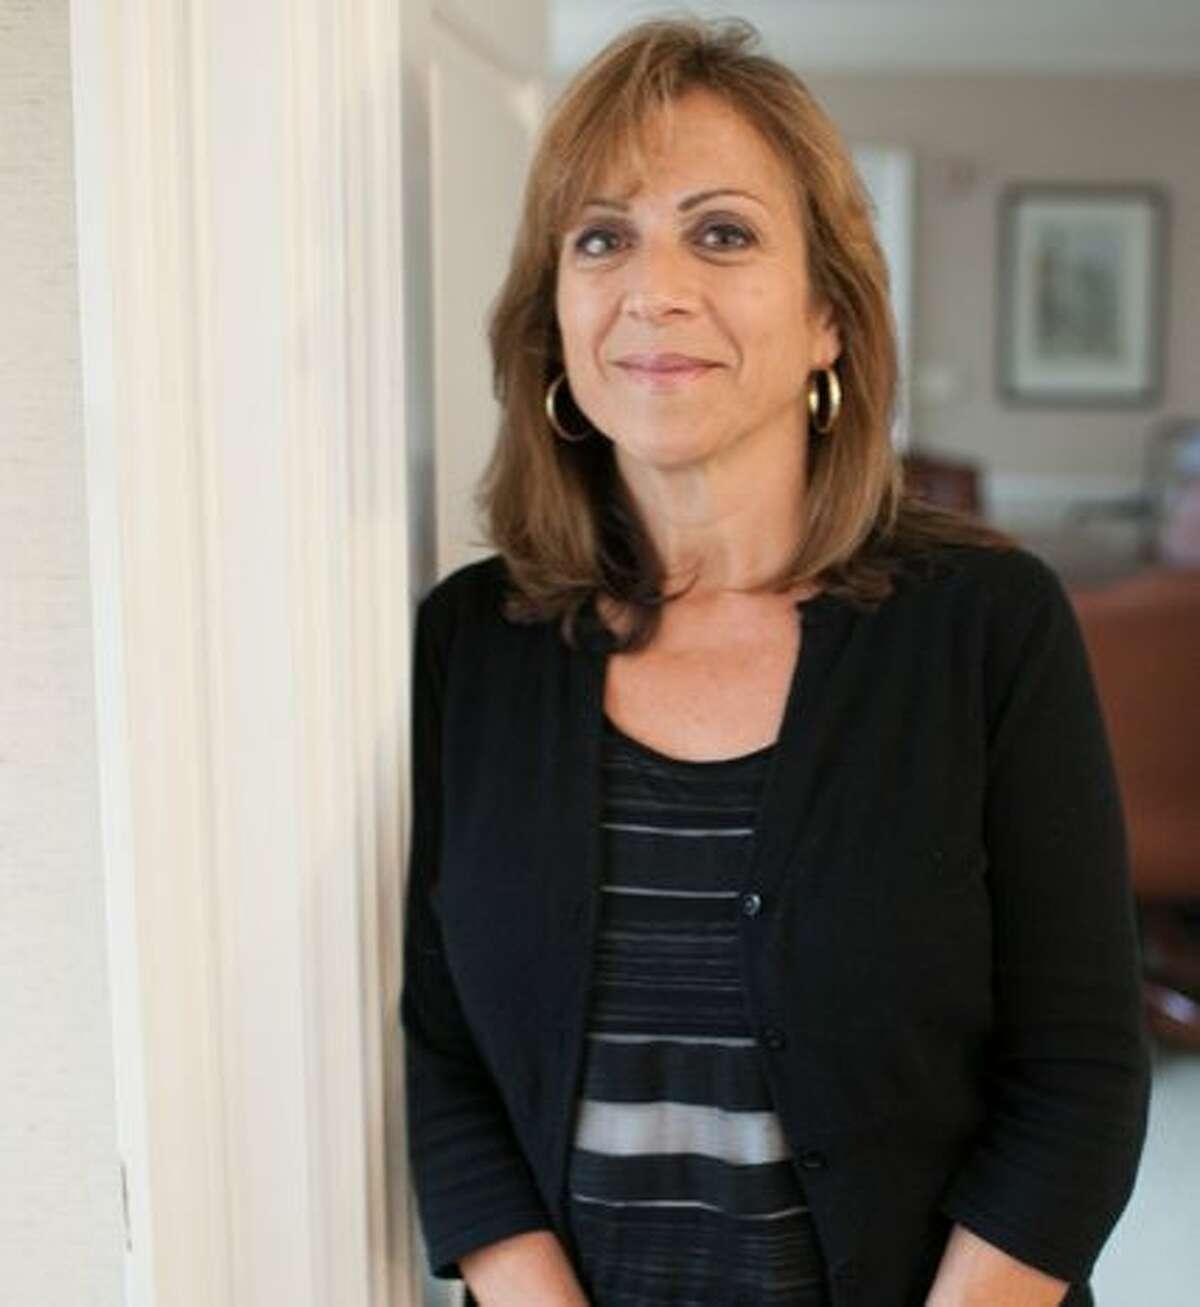 Cristina Garc�a